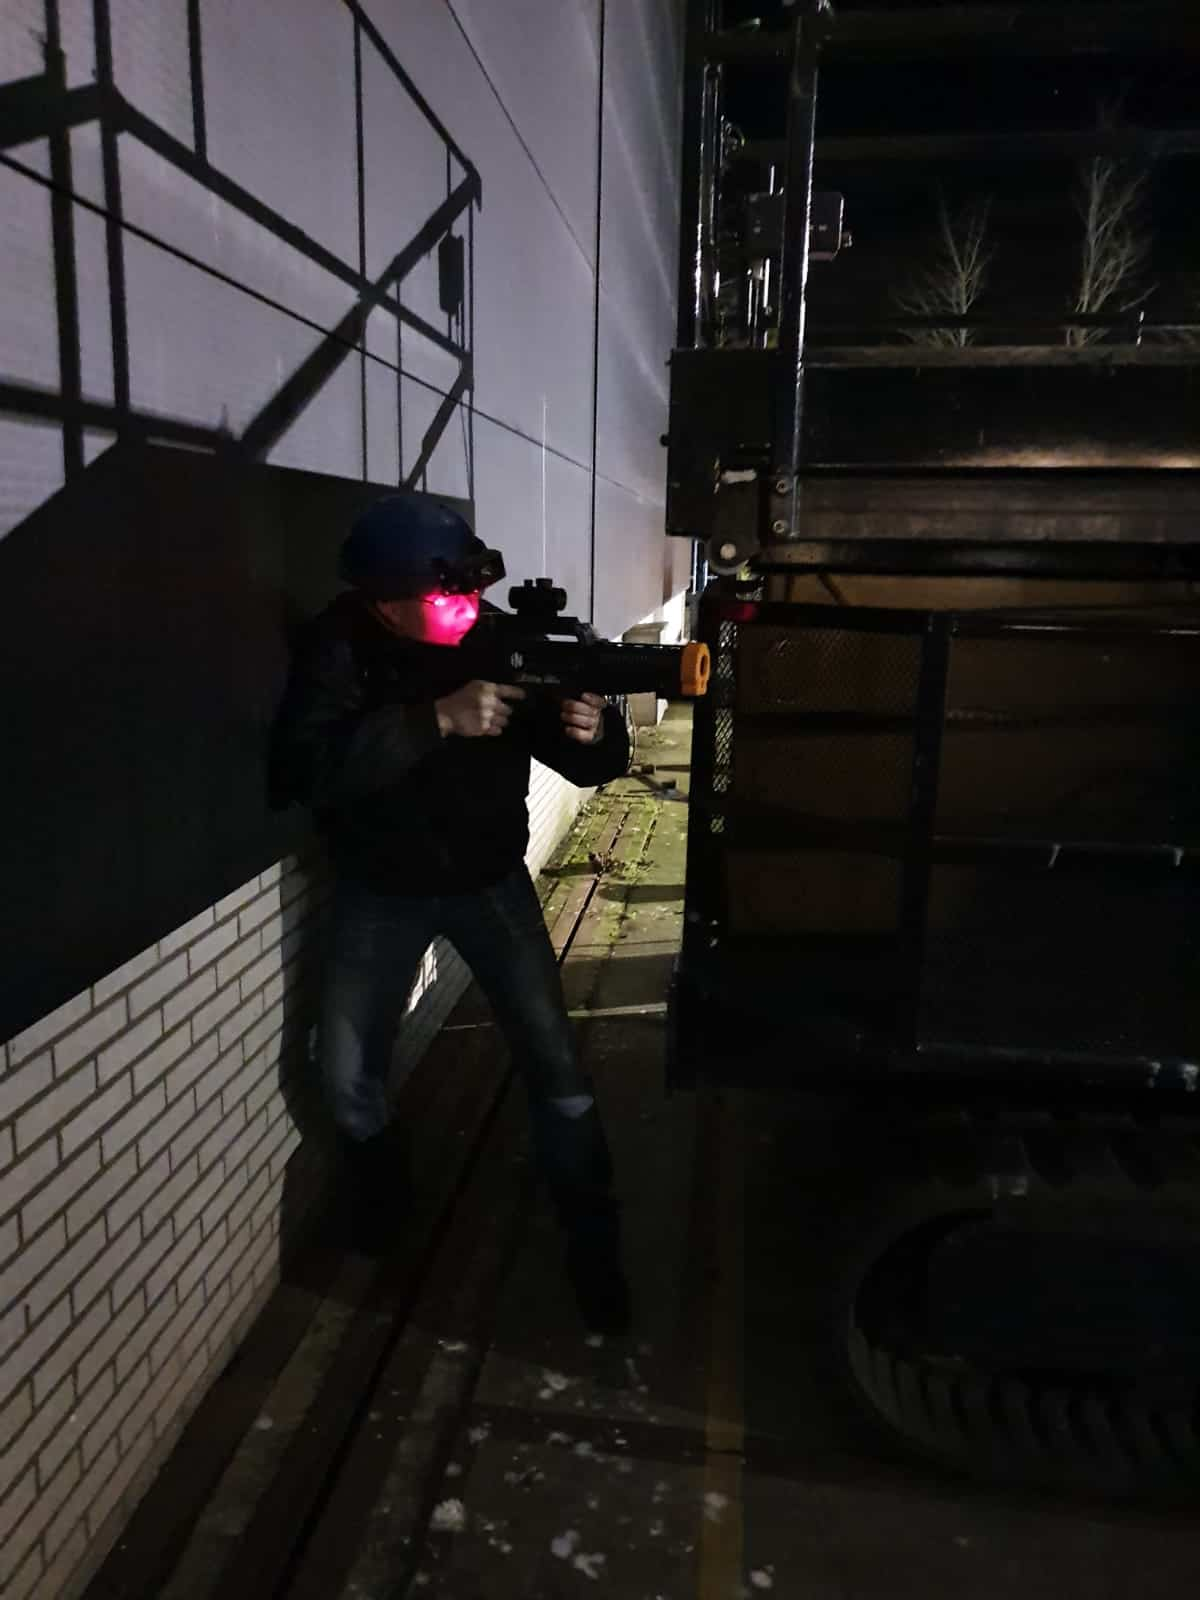 Lasergamen in het donker